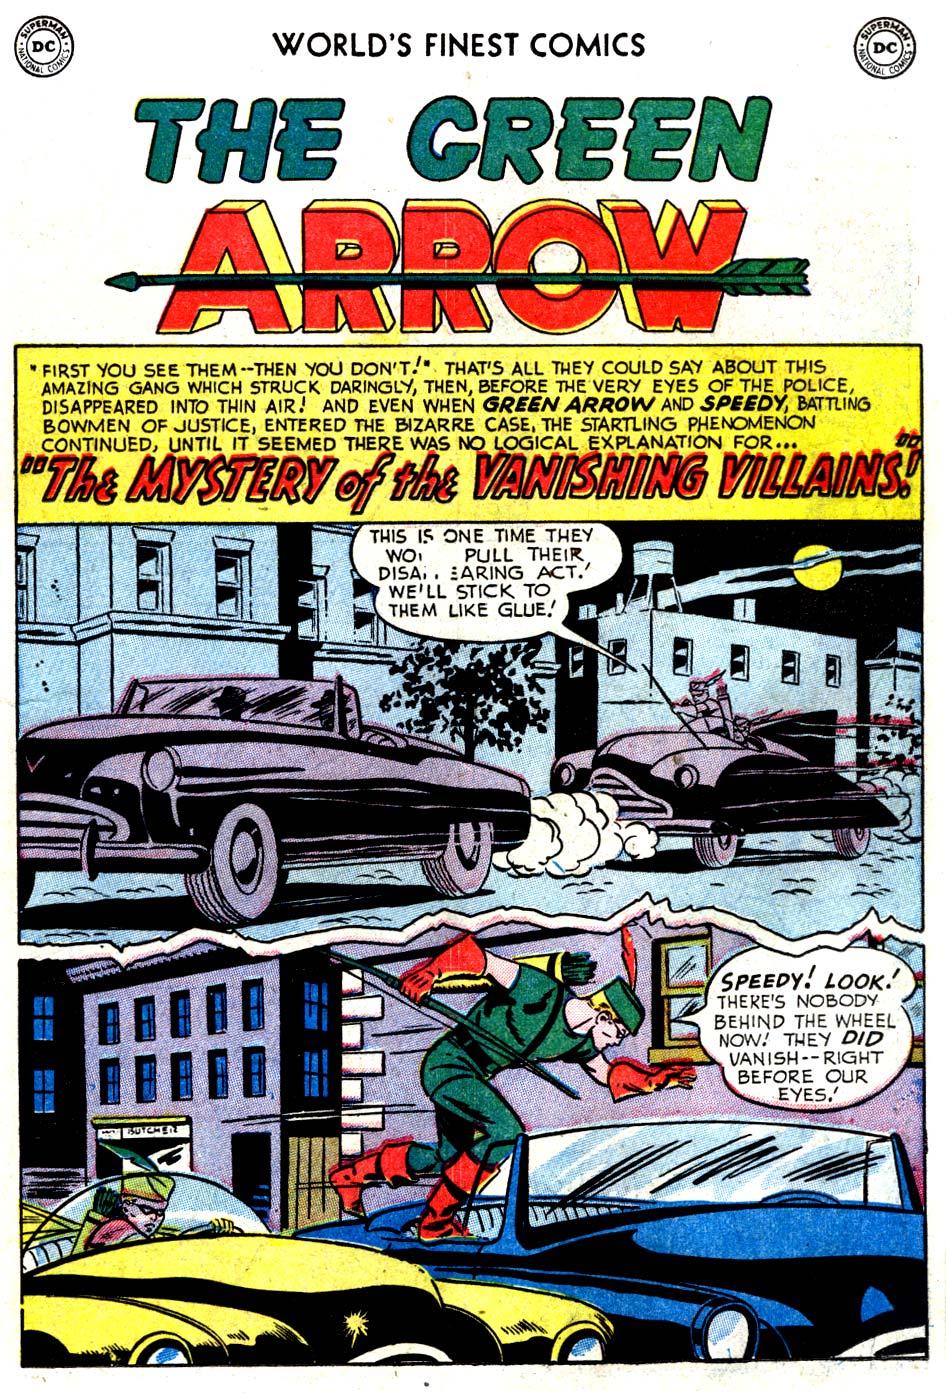 Read online World's Finest Comics comic -  Issue #68 - 27